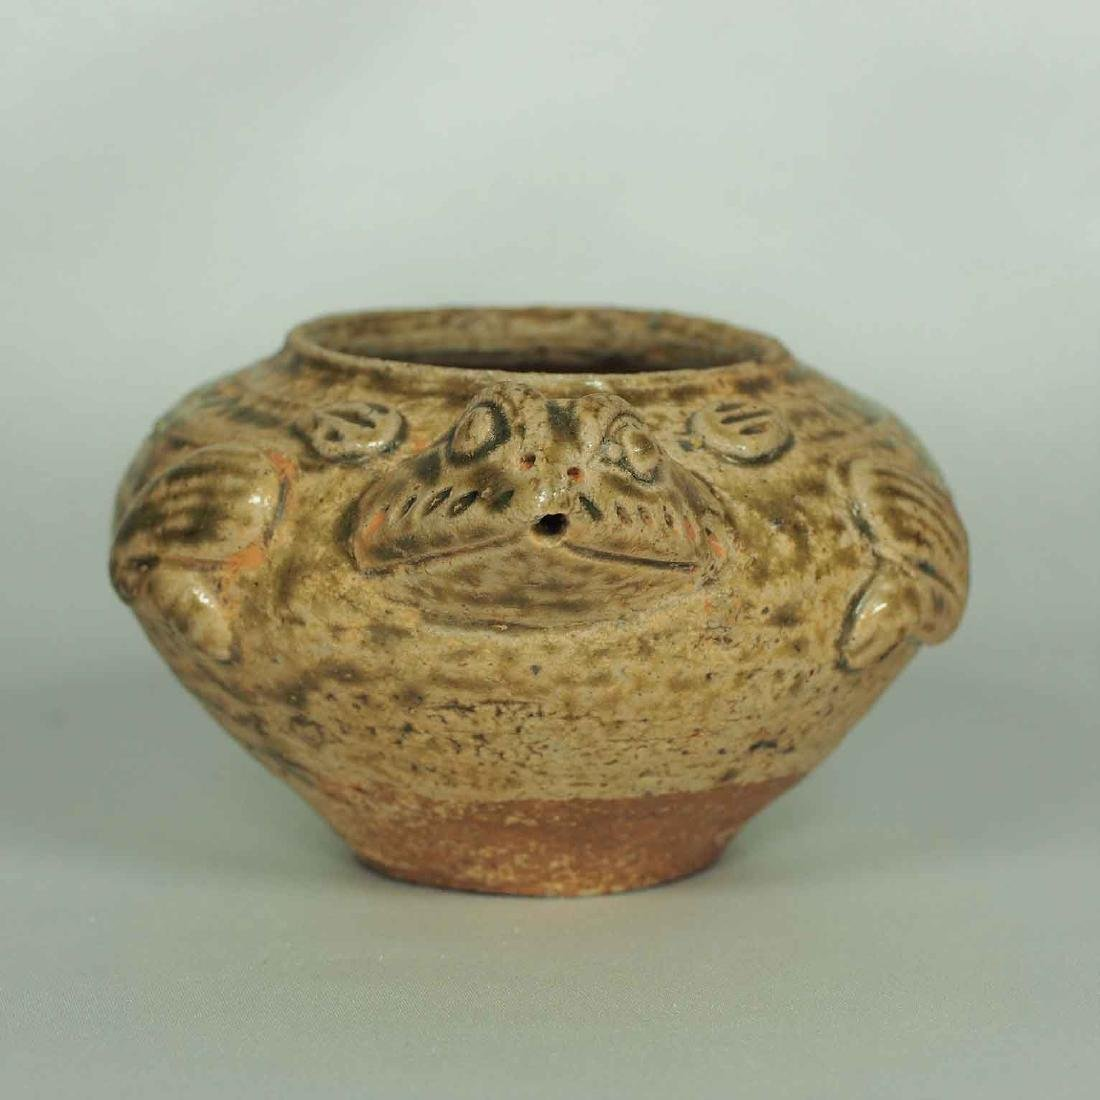 Proto-Porcelain Turtle-Form Water Pot, Han Dynasty - 5